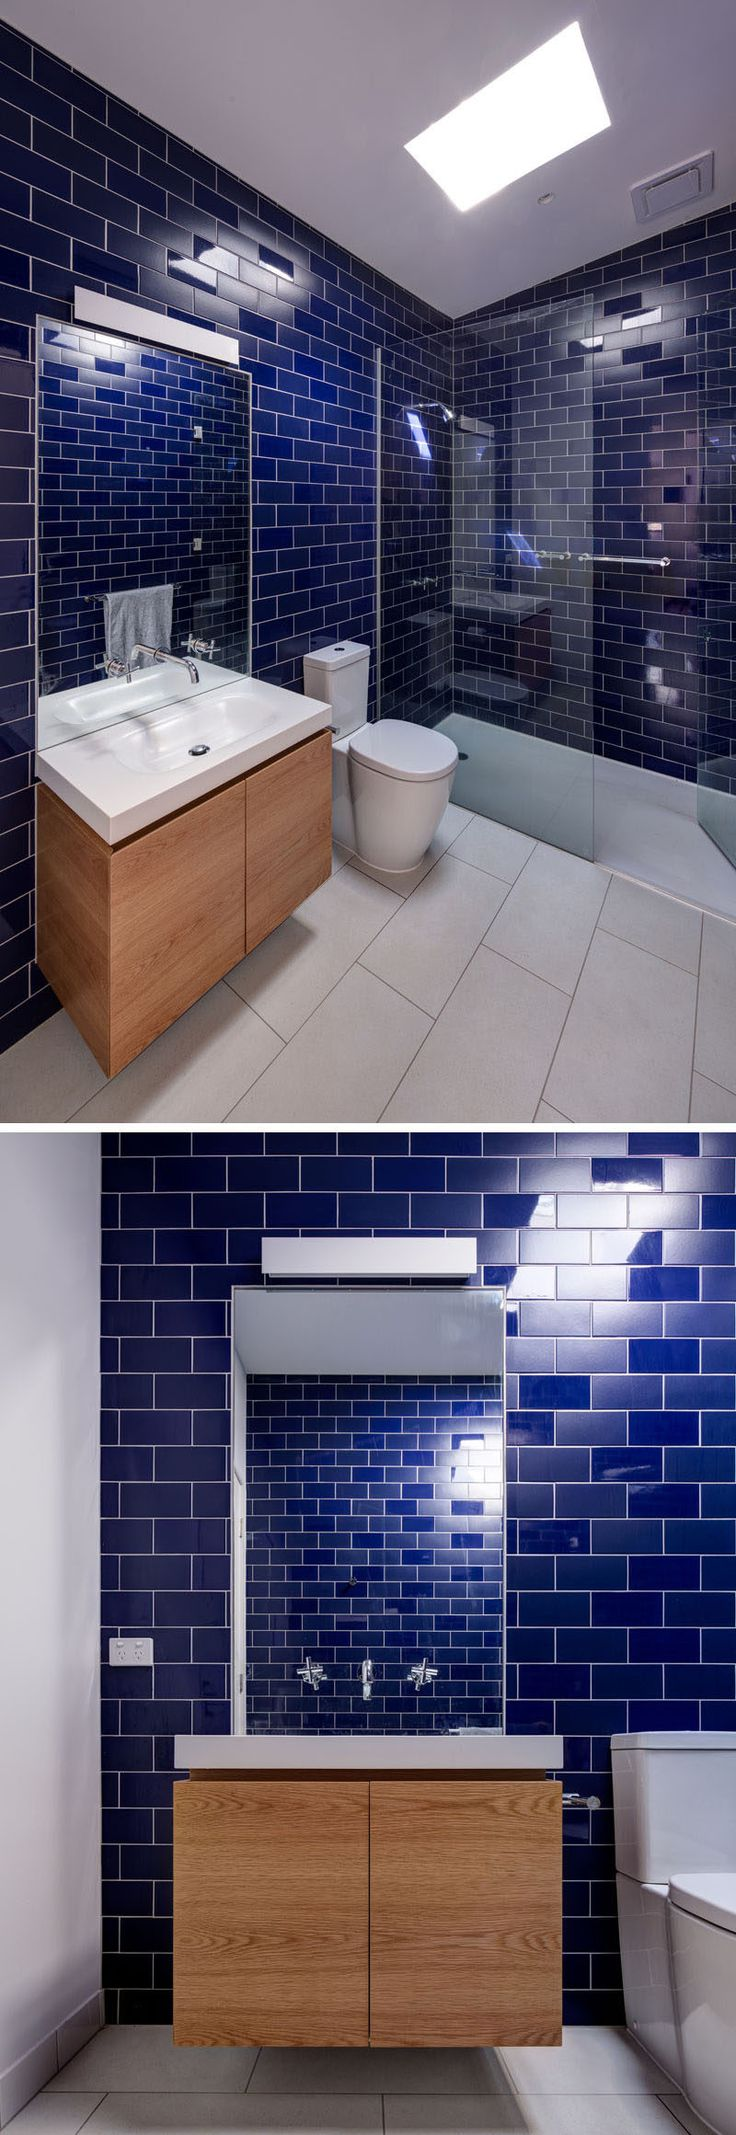 Best 3d Tiles Images On3d Tiles Amazing Ideas and